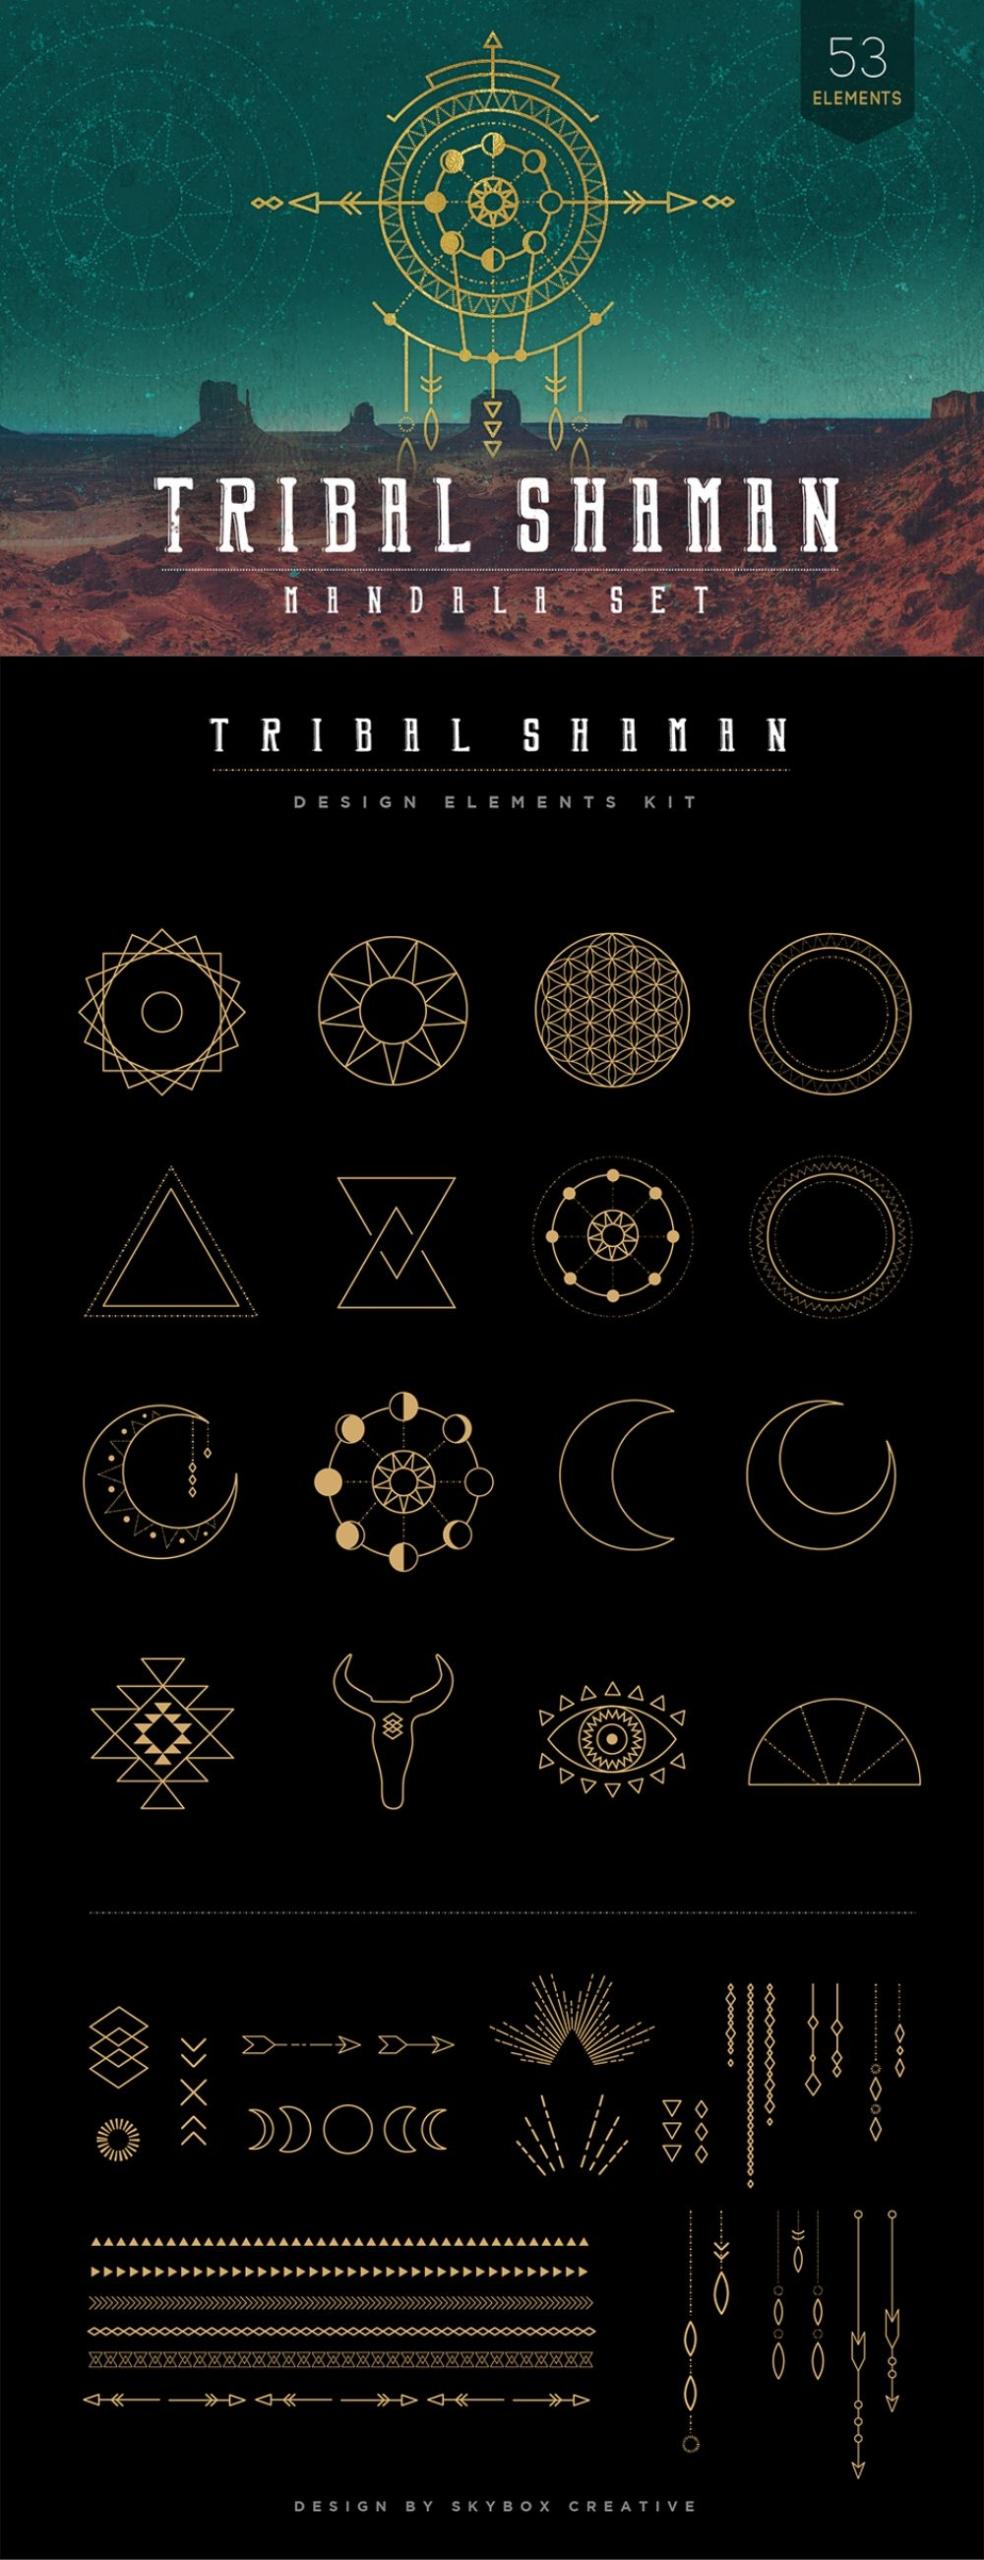 Mandala Set Tribal Elements & Shaman